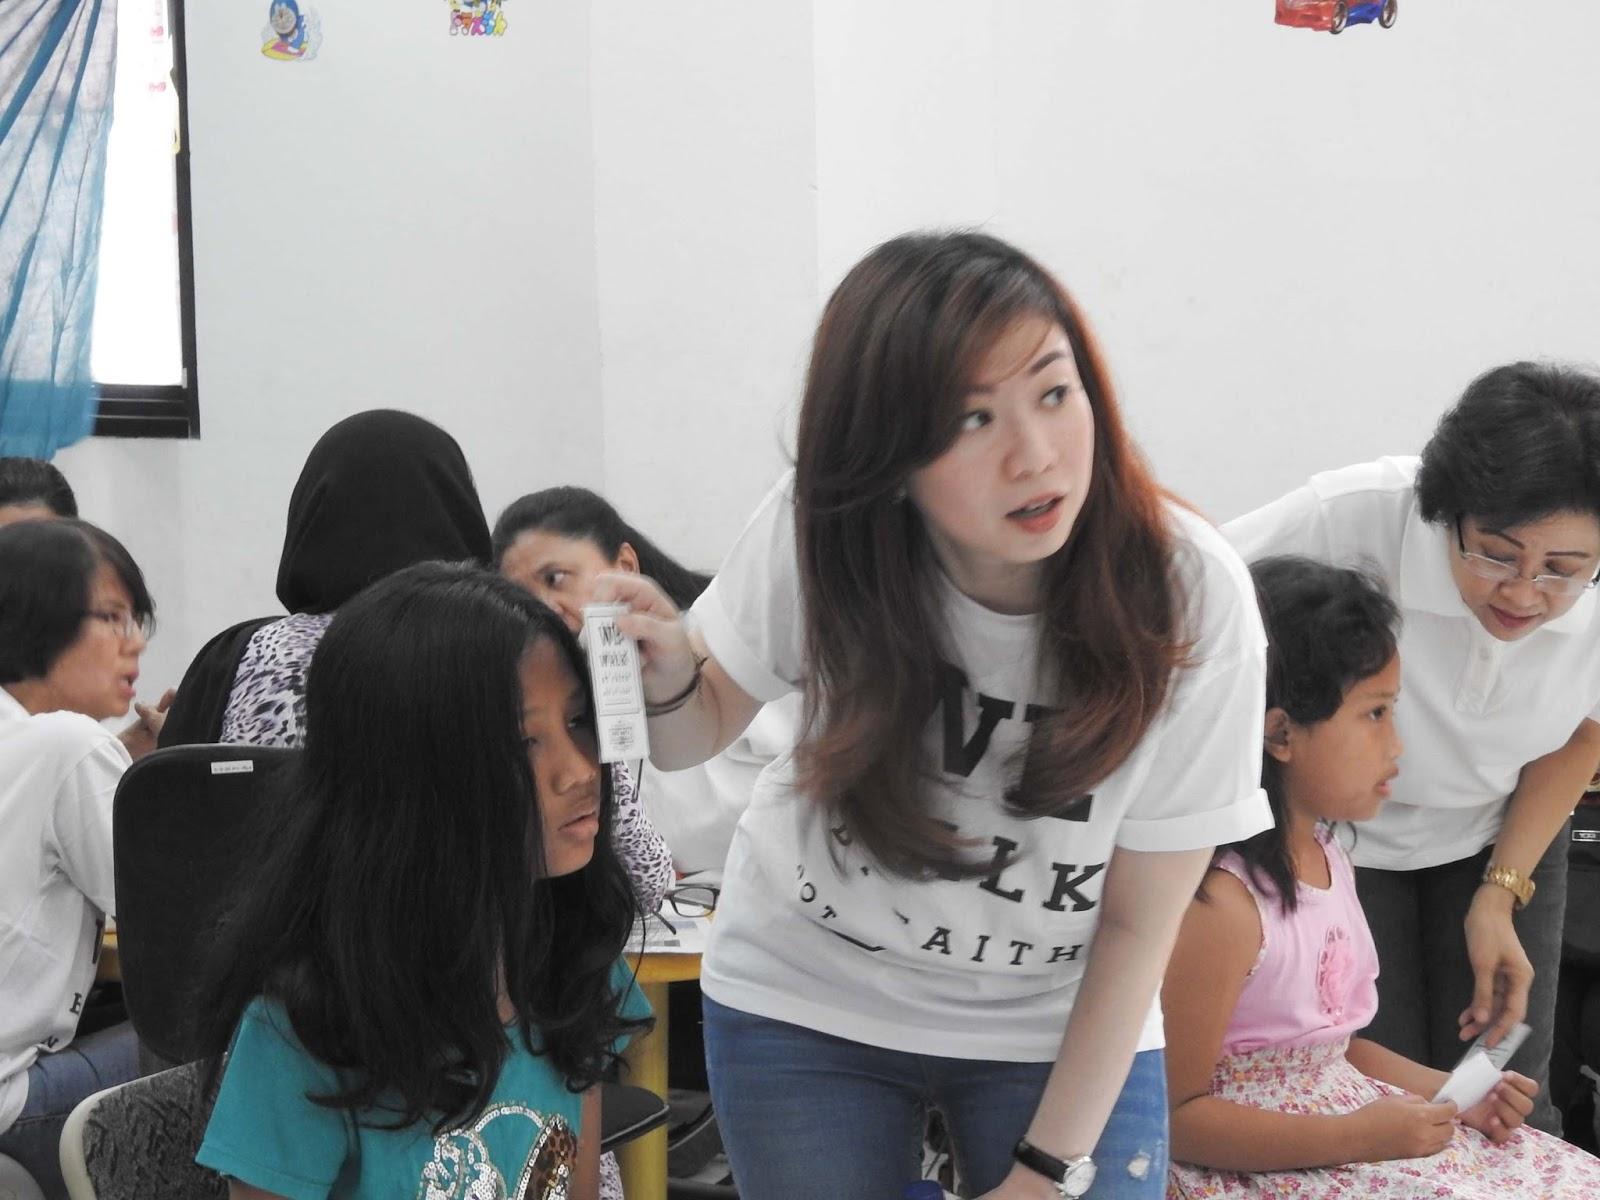 Bakti Sosial VII - 1000 Mata Anak Bangsa Melihat Terang - Rusunawa Pulo Gebang, Jakarta Timur image